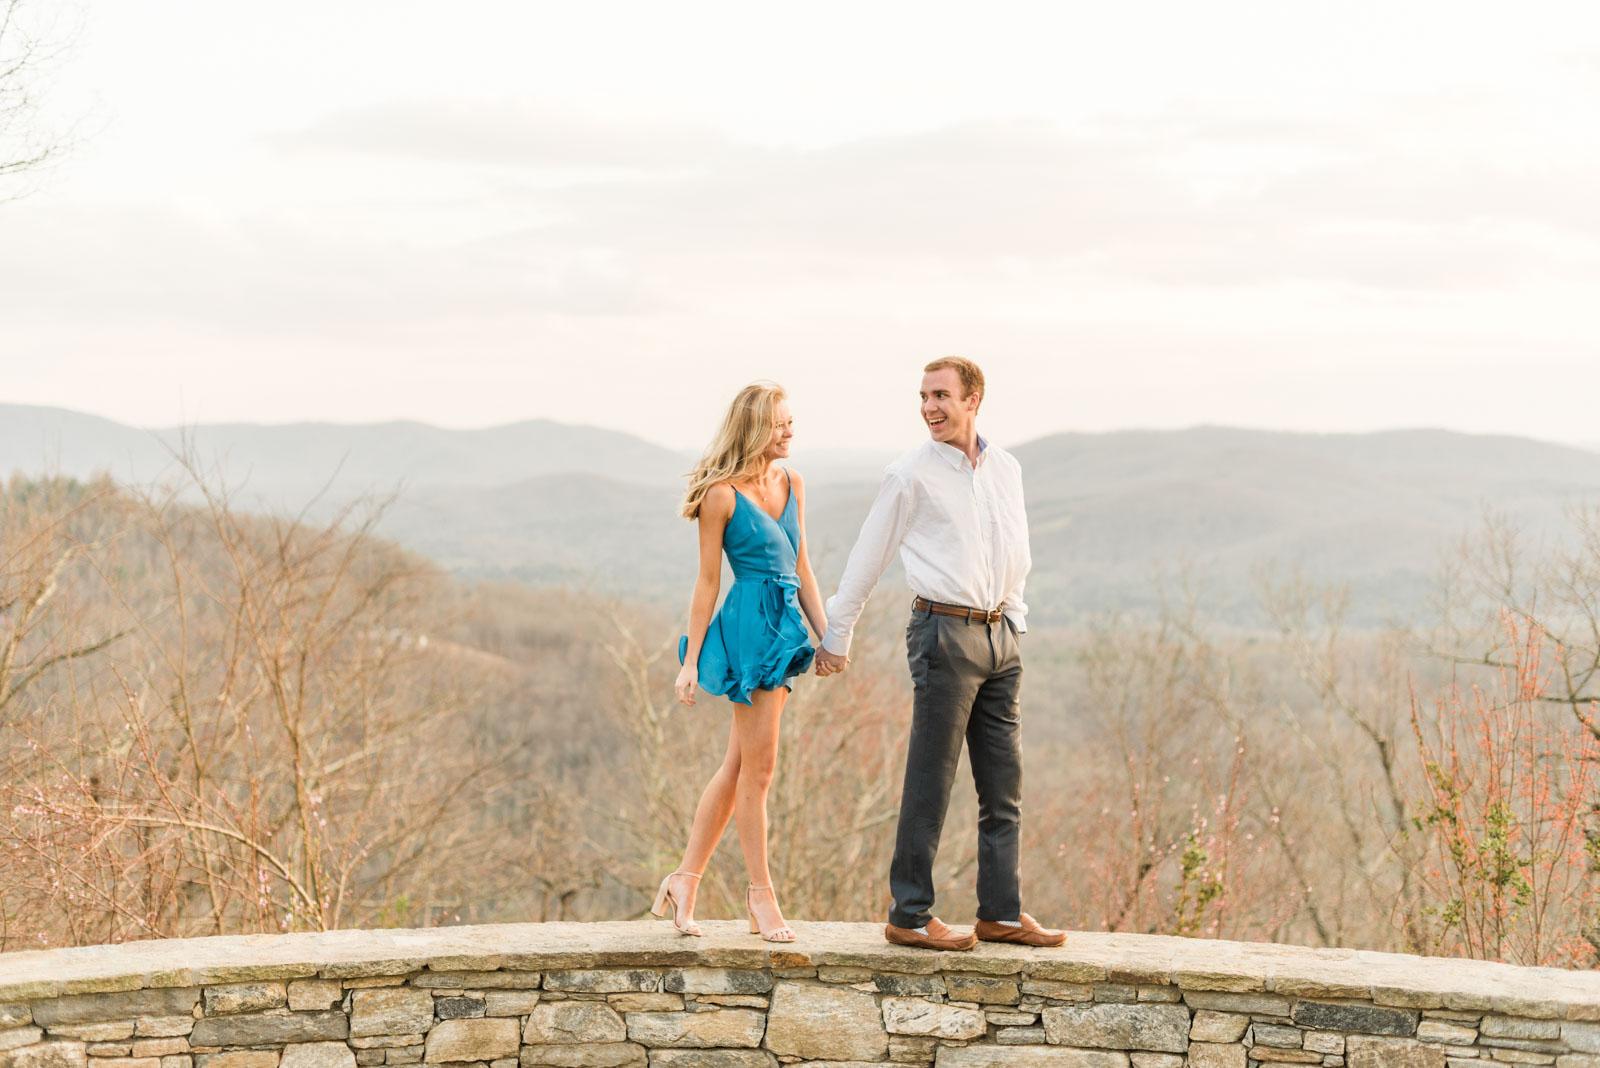 Sunset Mountain Engagement in North Carolina Morgan & Nathan Markie Walden Photography-31.jpg